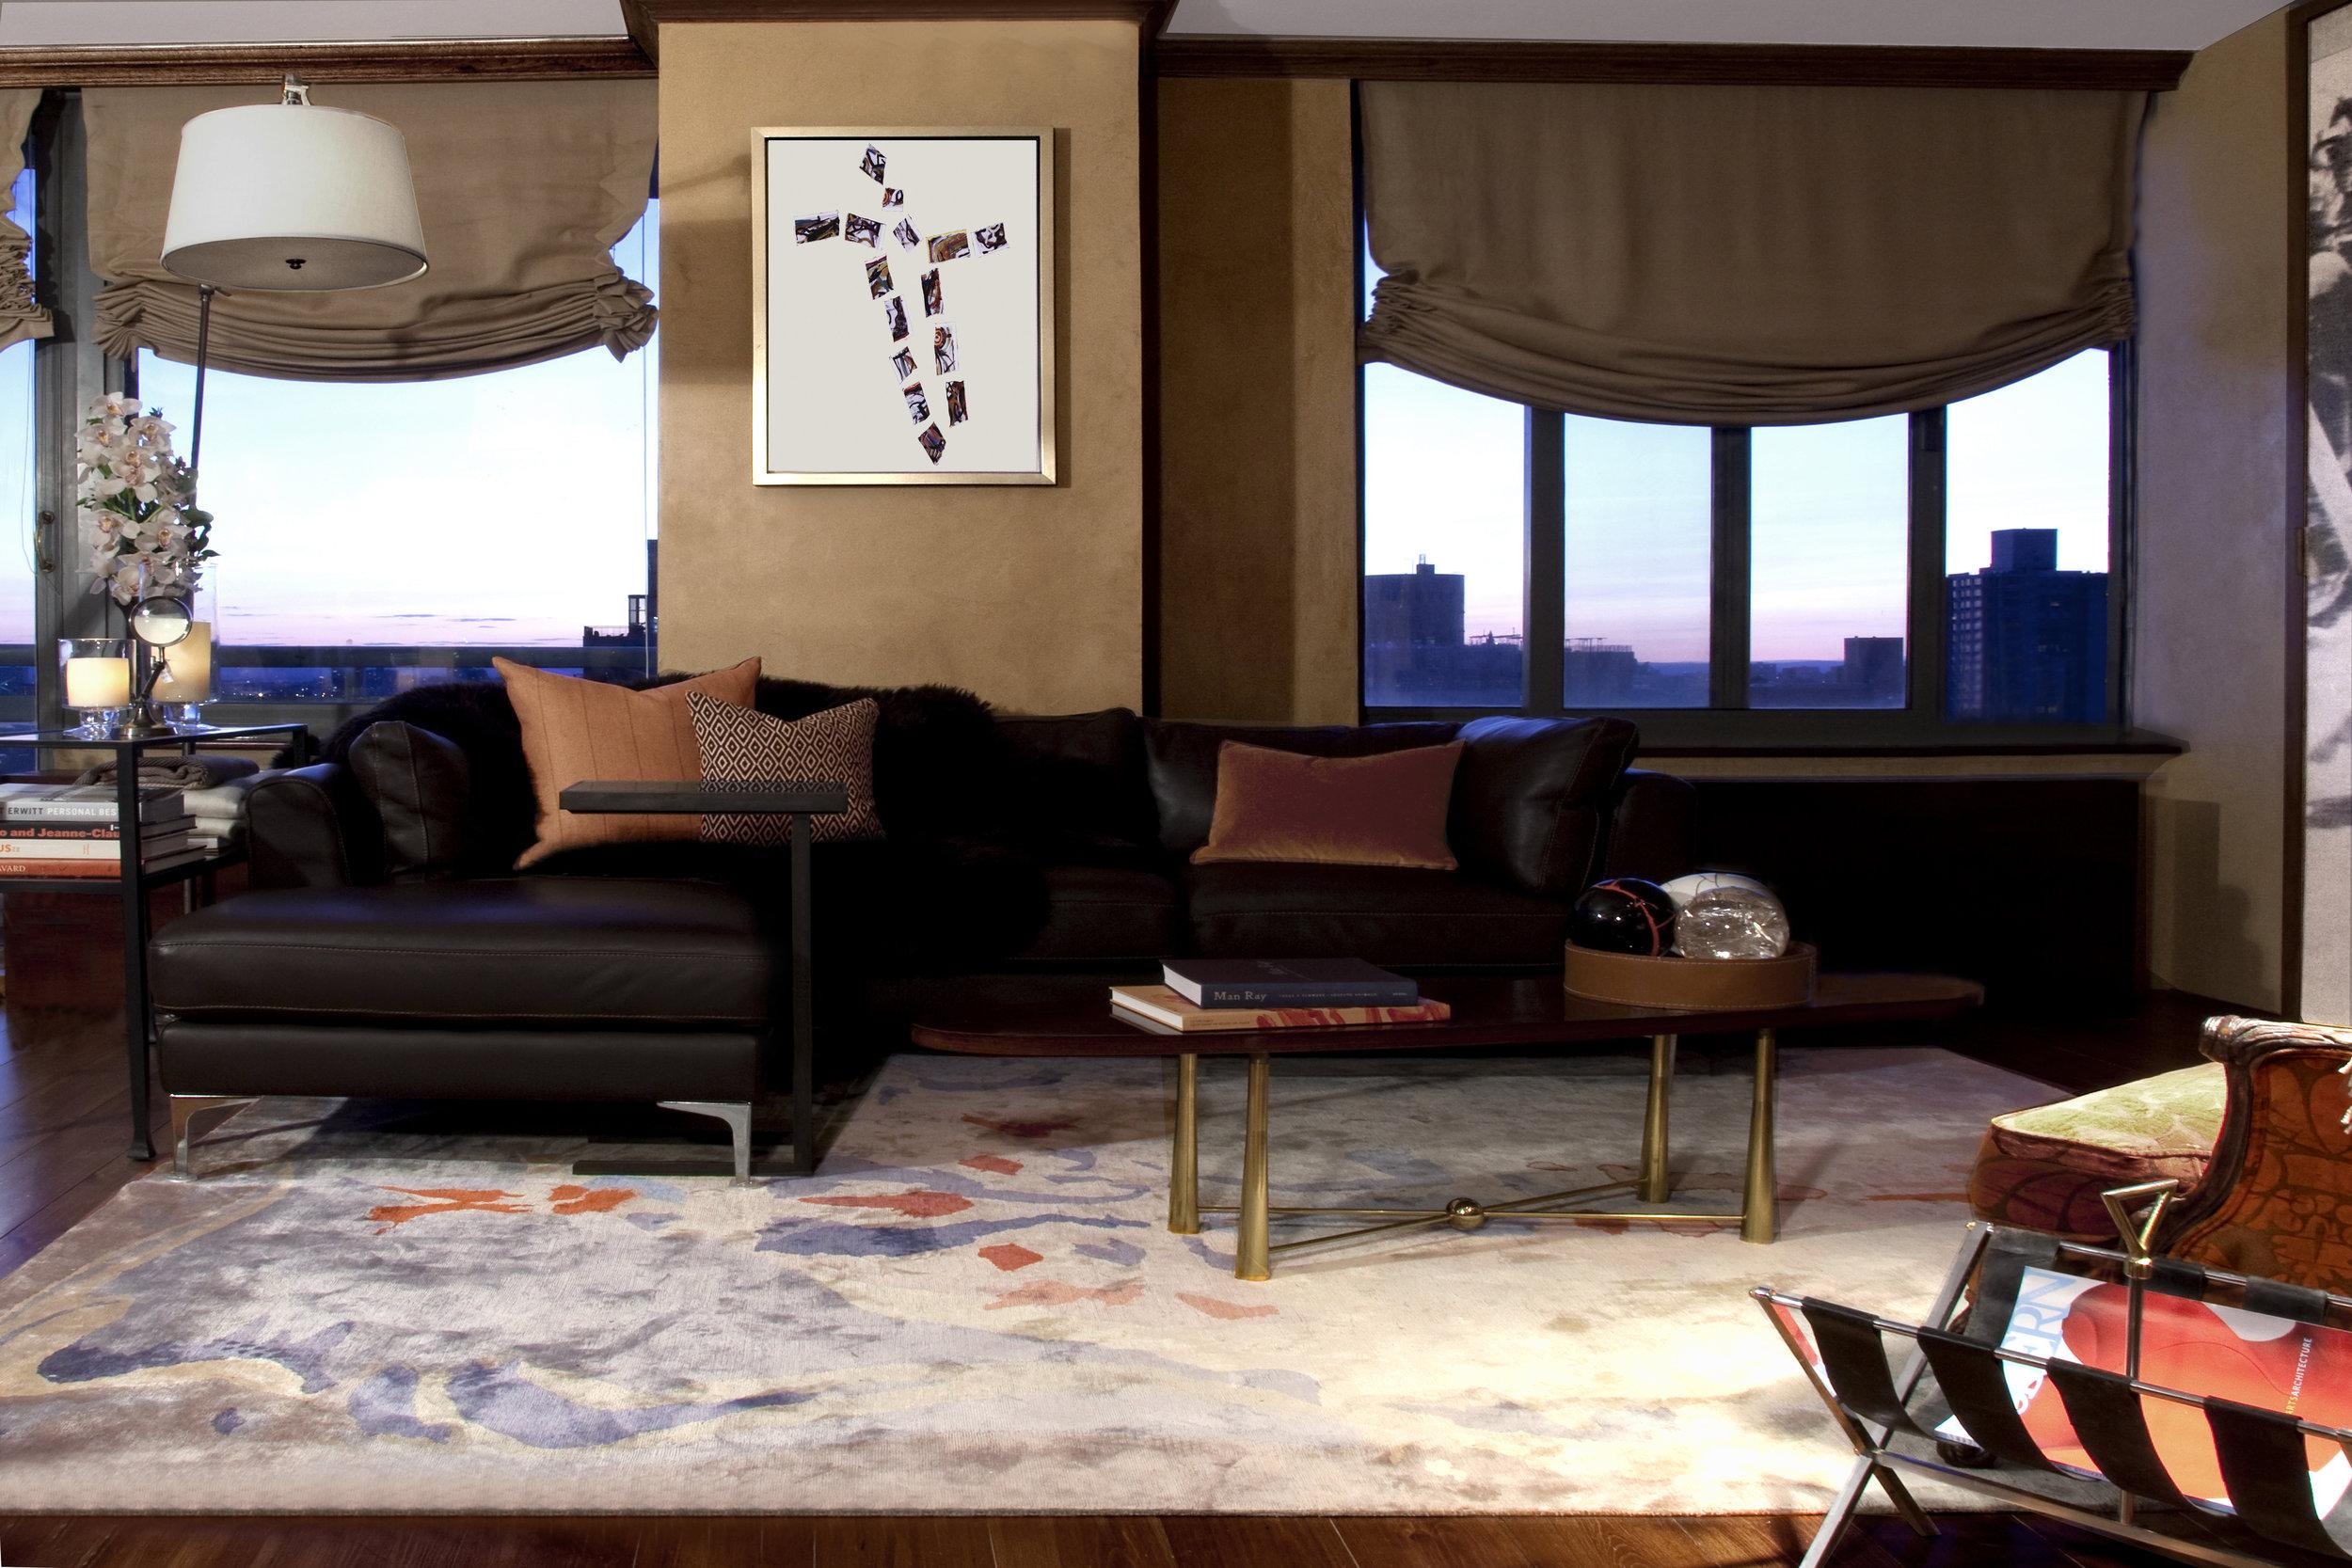 Best Interior Decorators in New York City - Joe Ginsberg